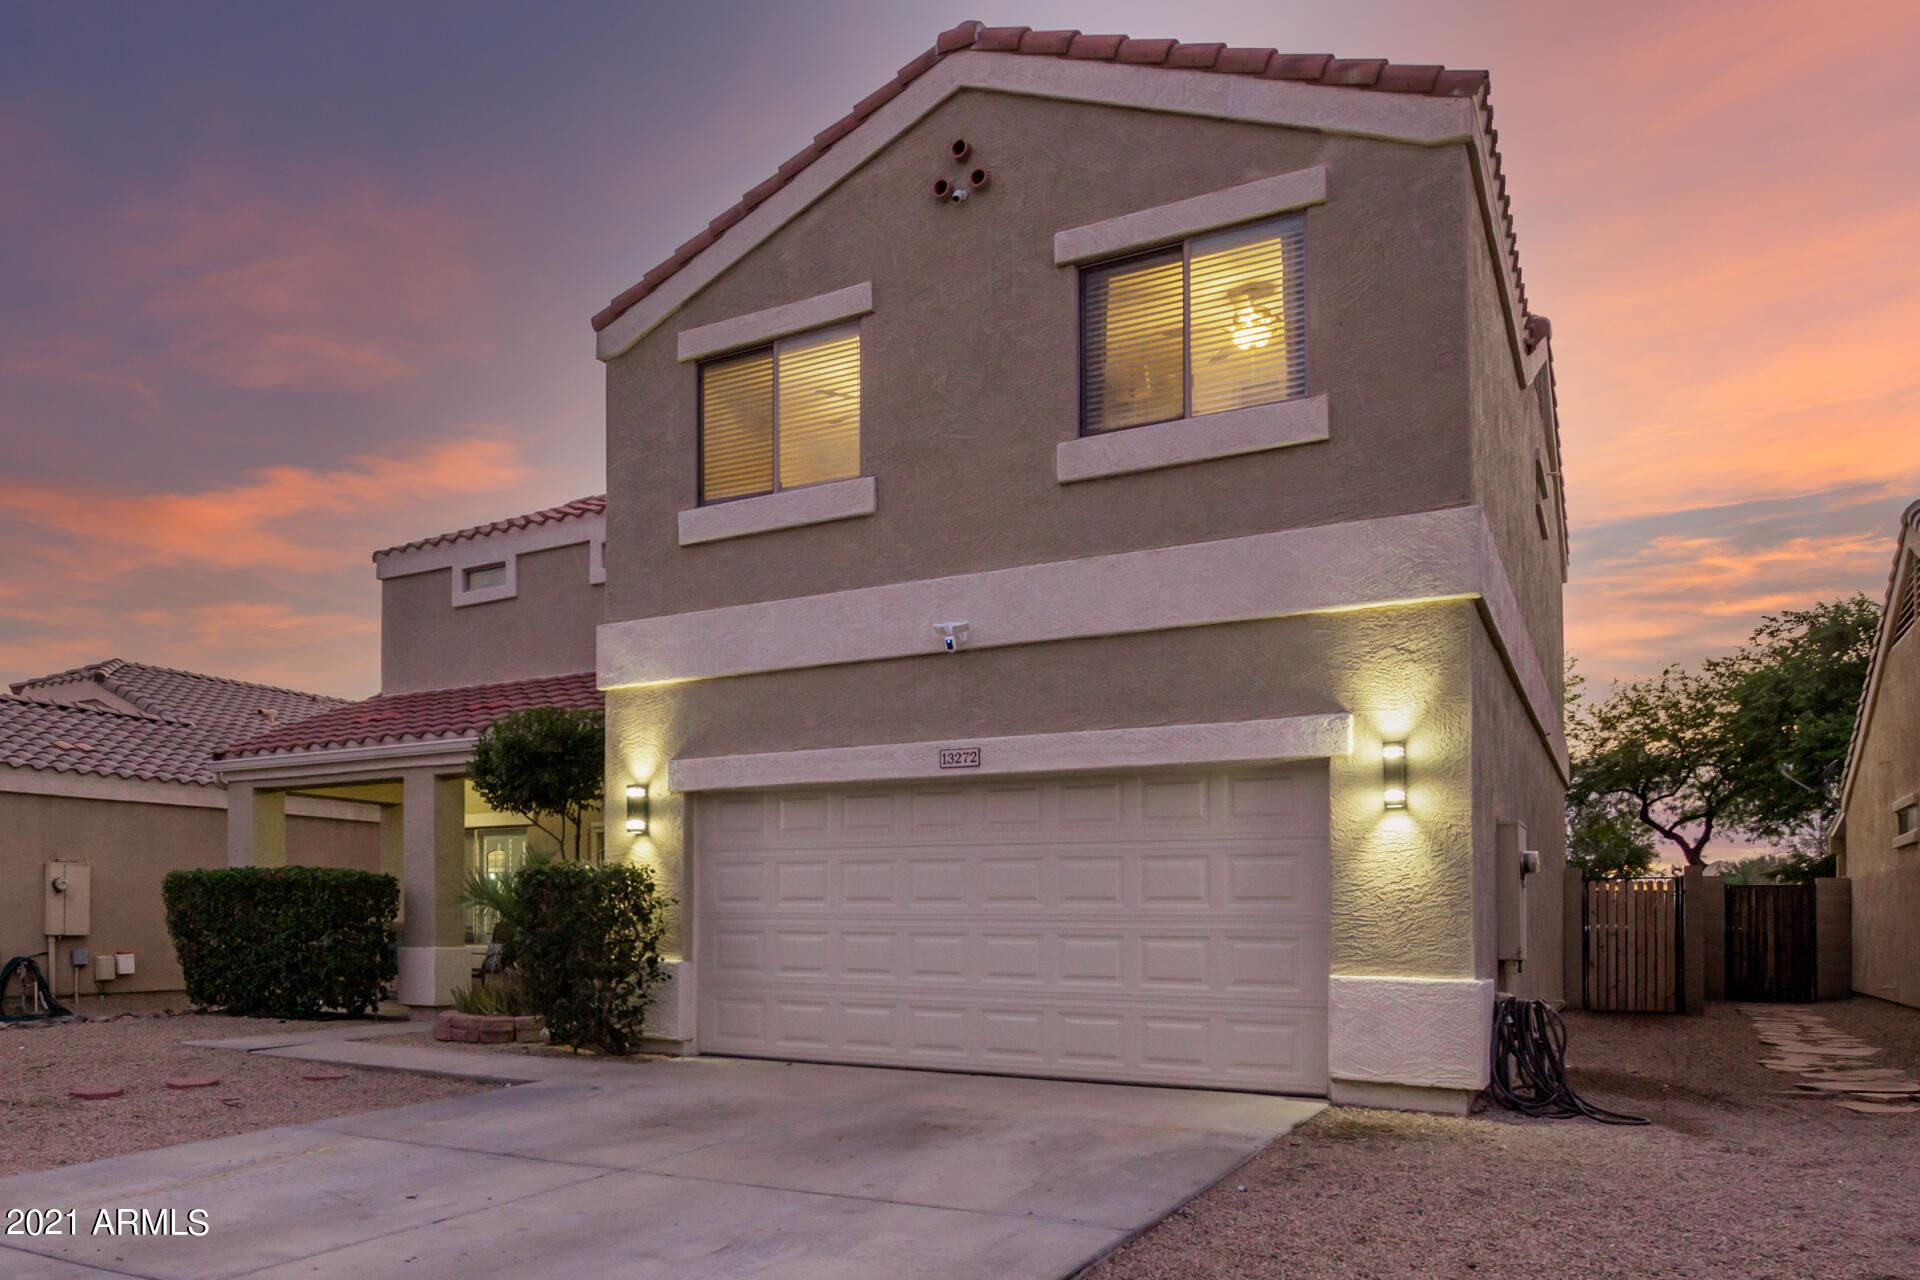 Photo of 13272 N ALTO Street, El Mirage, AZ 85335 (MLS # 6301210)